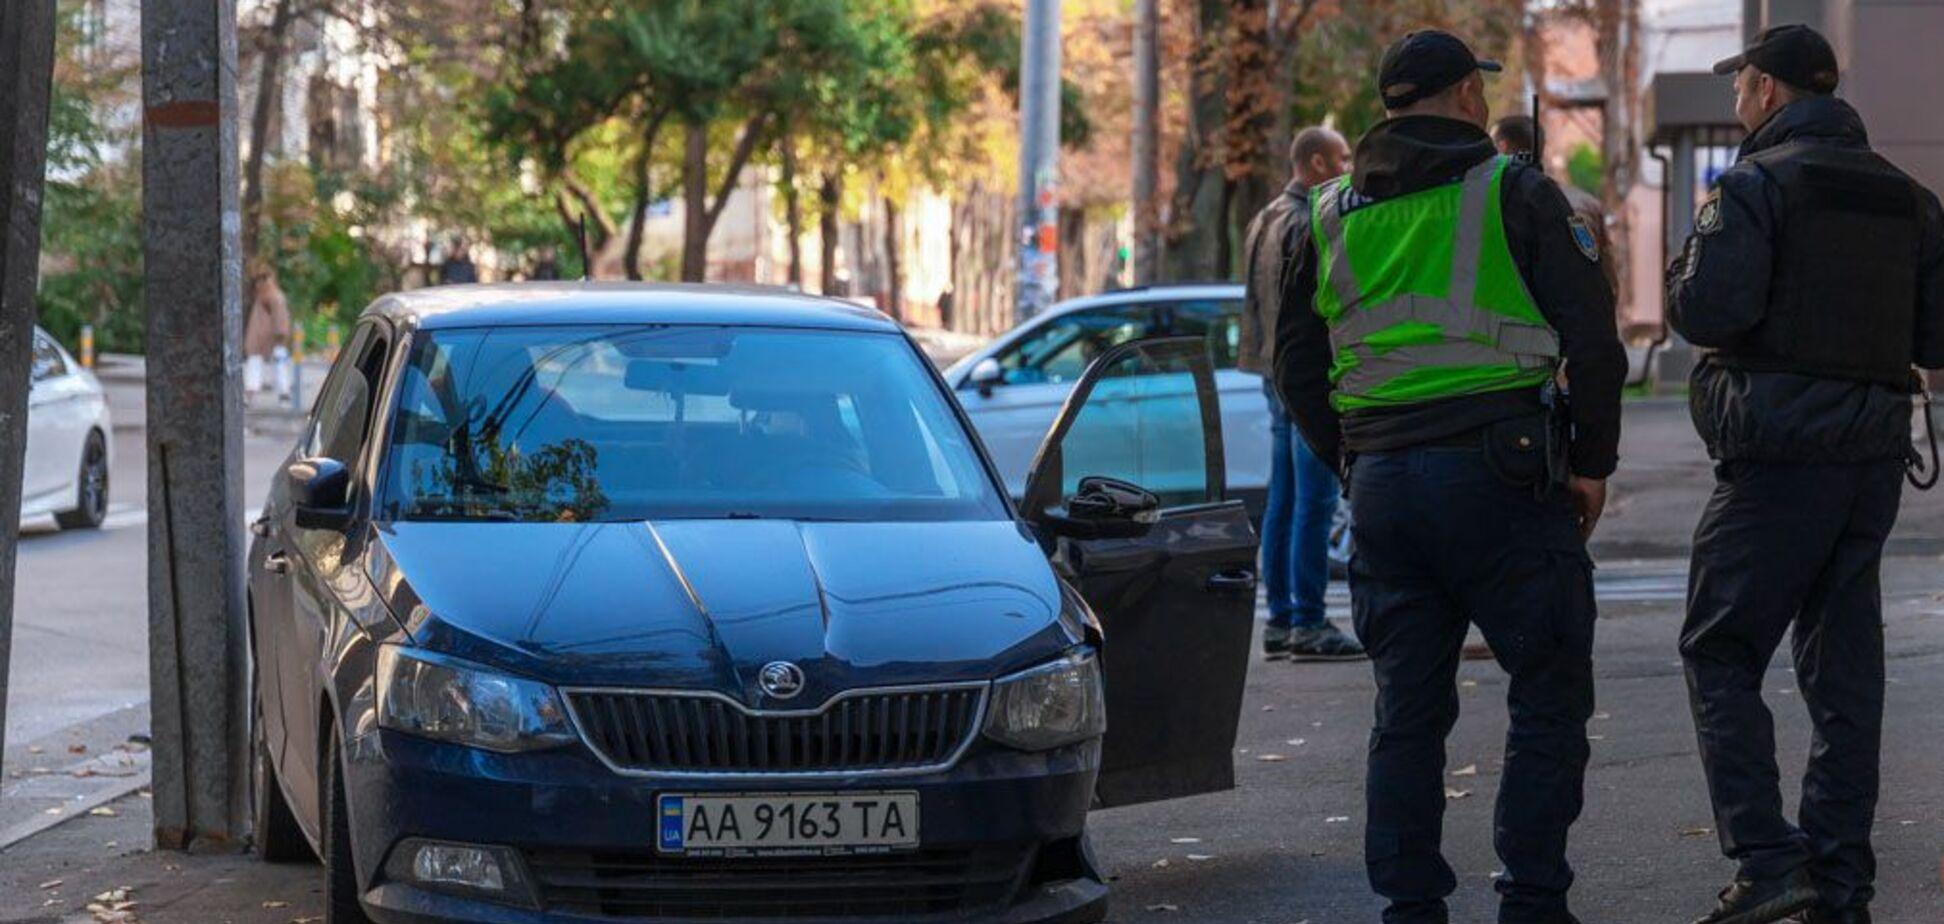 В Днепре из-за столкновения легковушек пострадали два человека. Фото с места аварии